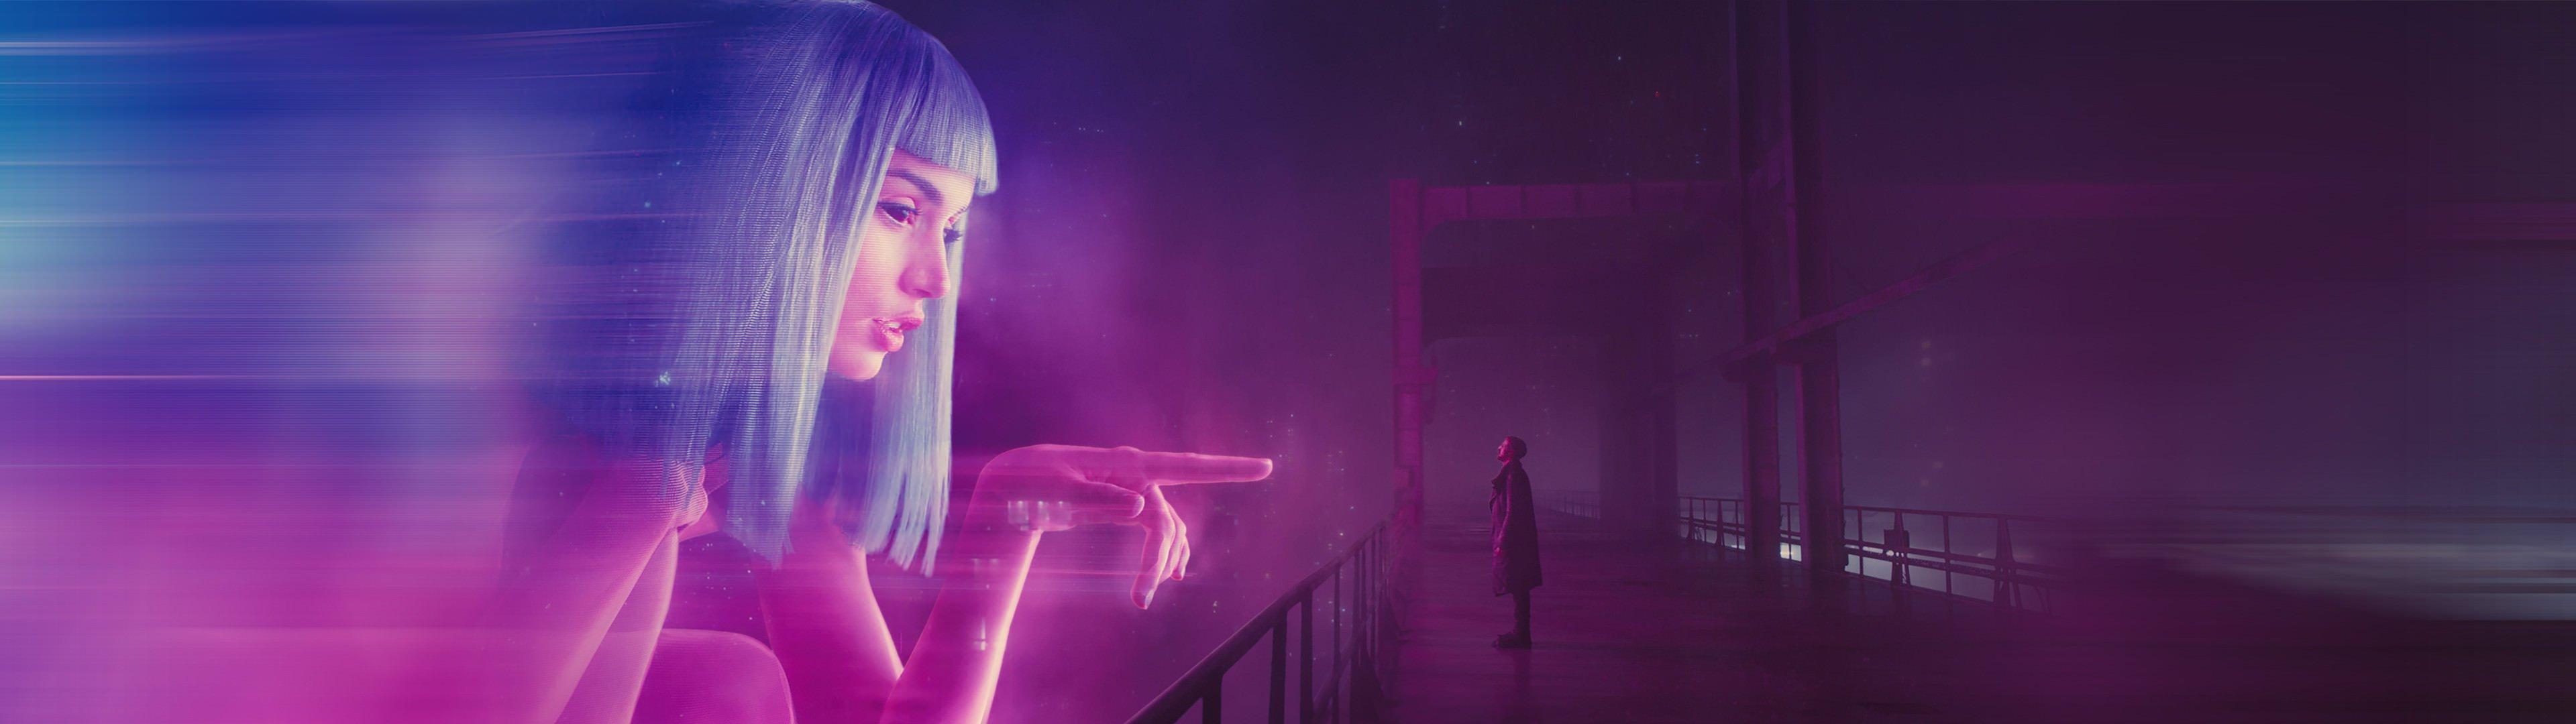 Blade Runner 2049 Hologram Girl Wallpaper Blade Wallpapers Photos And Desktop Backgrounds Up To 8k